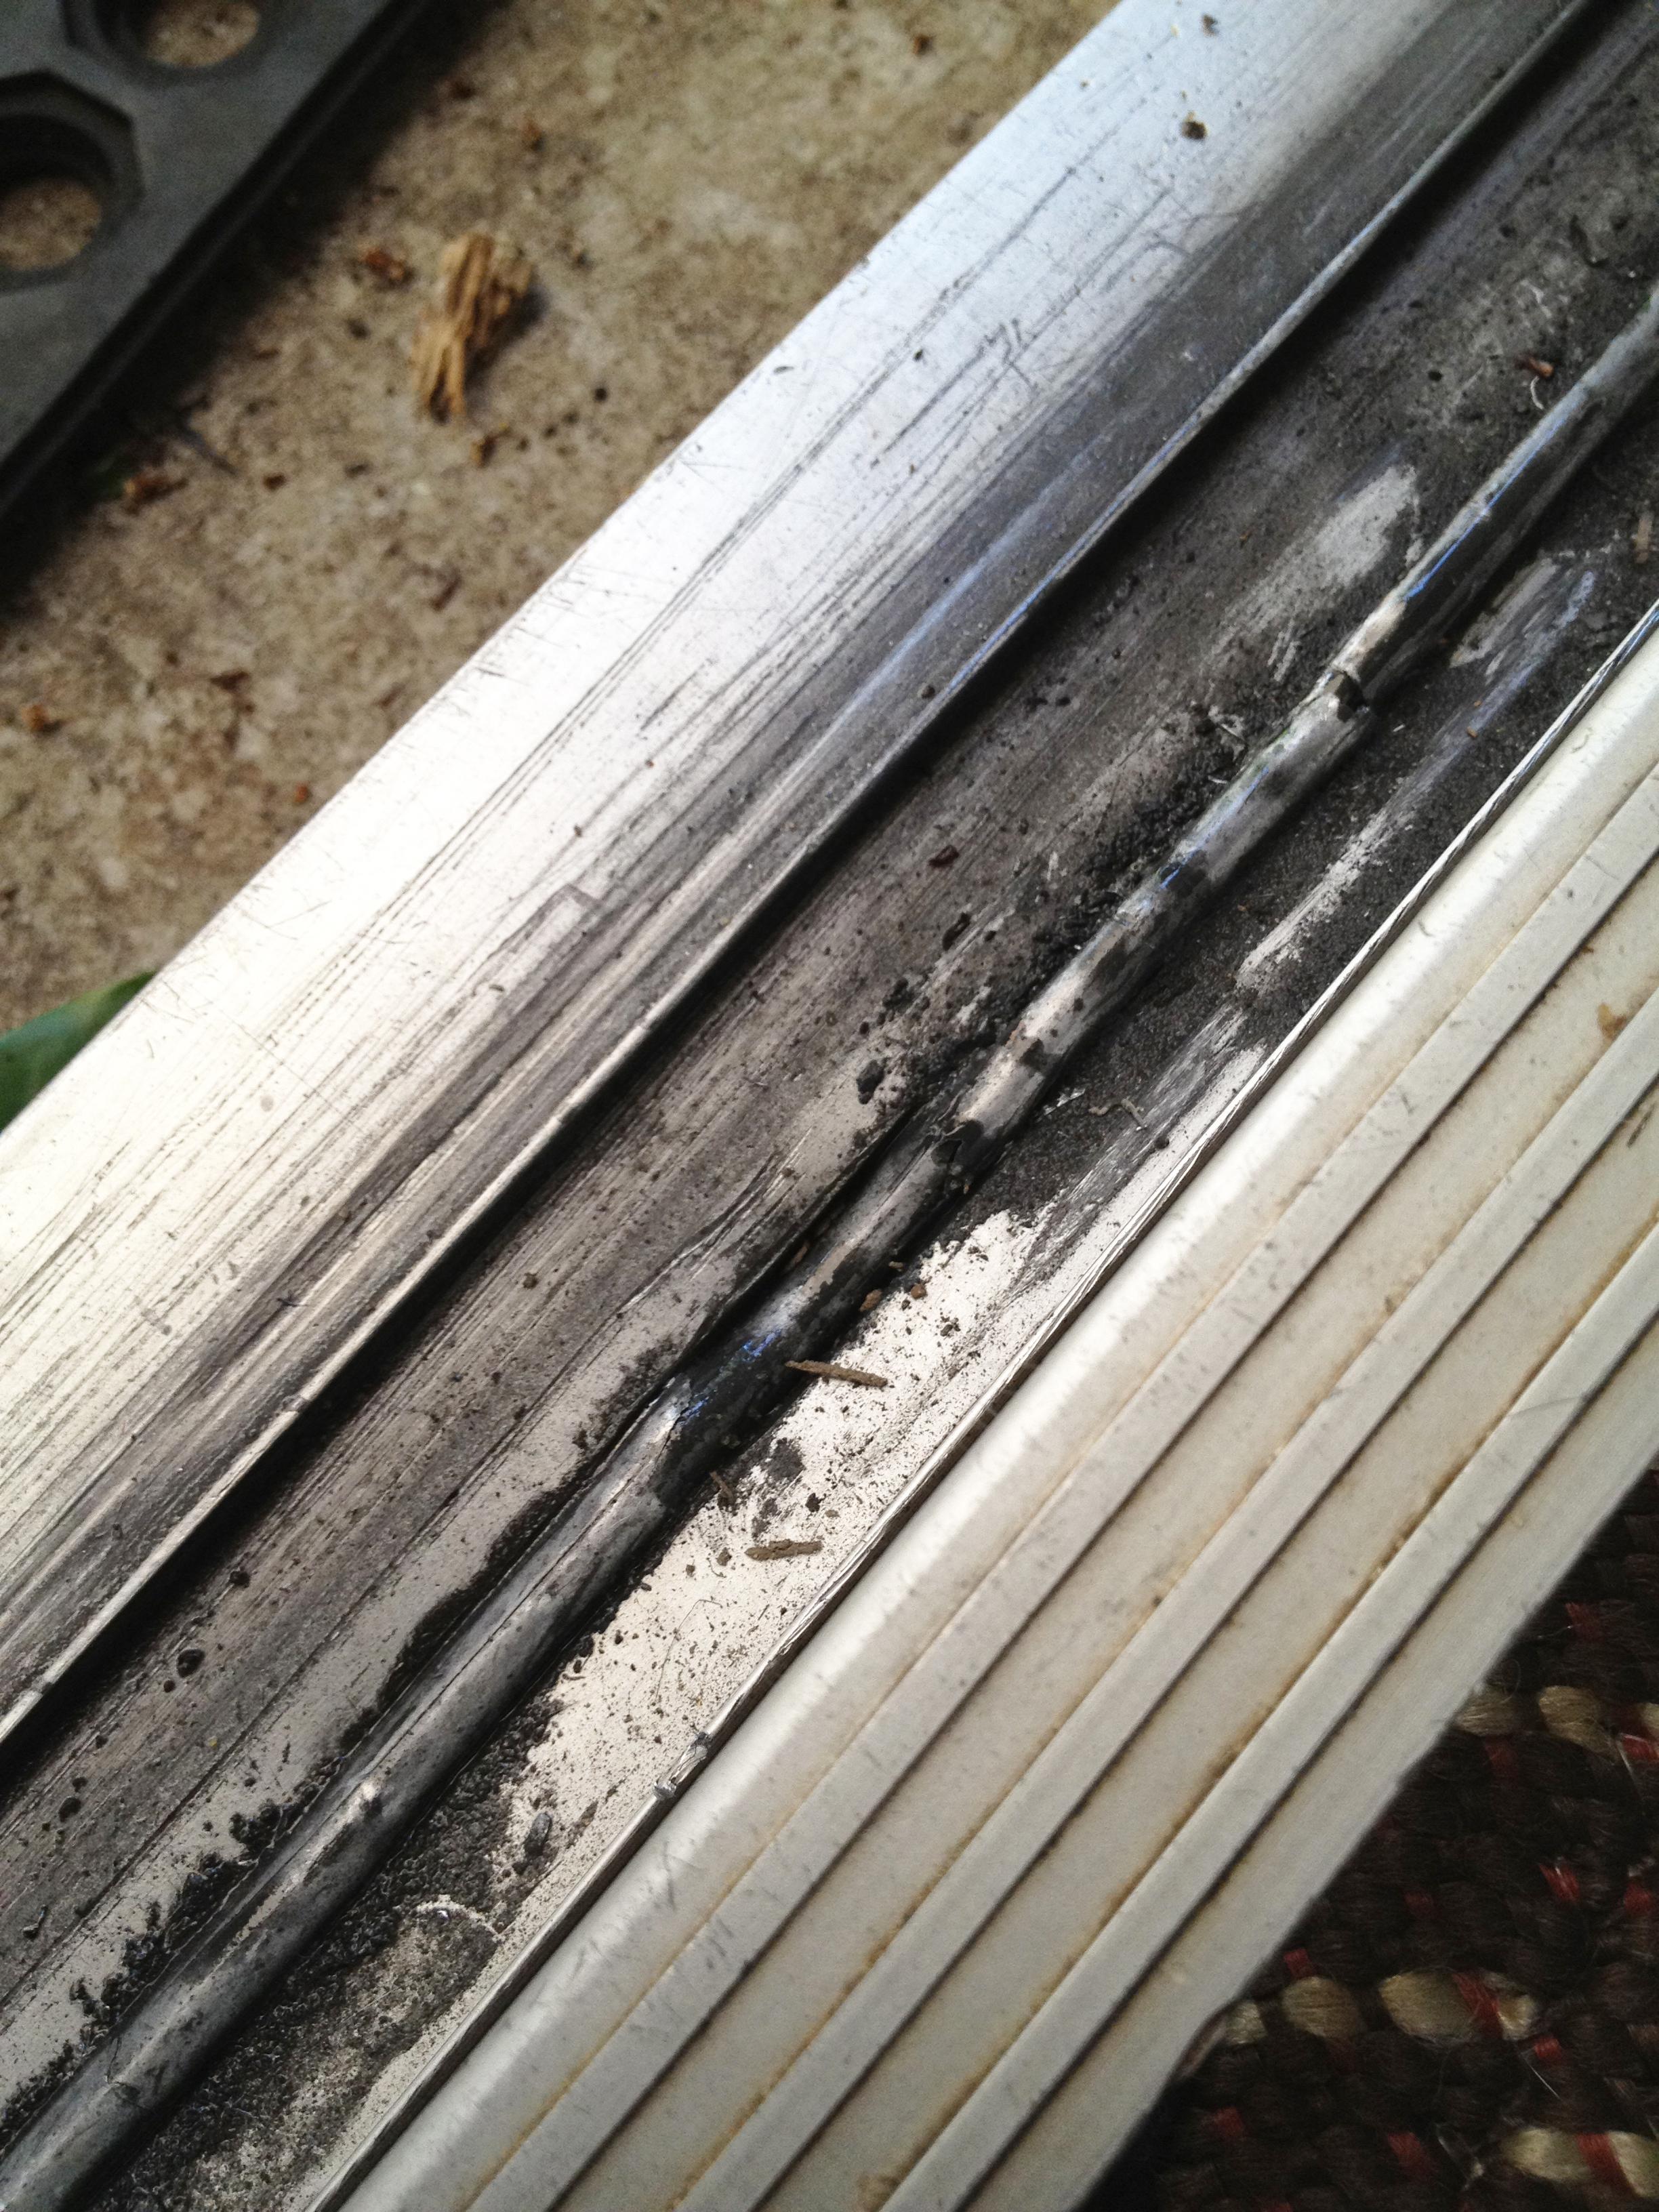 Repairing Sliding Glass Door Tracksee us in action